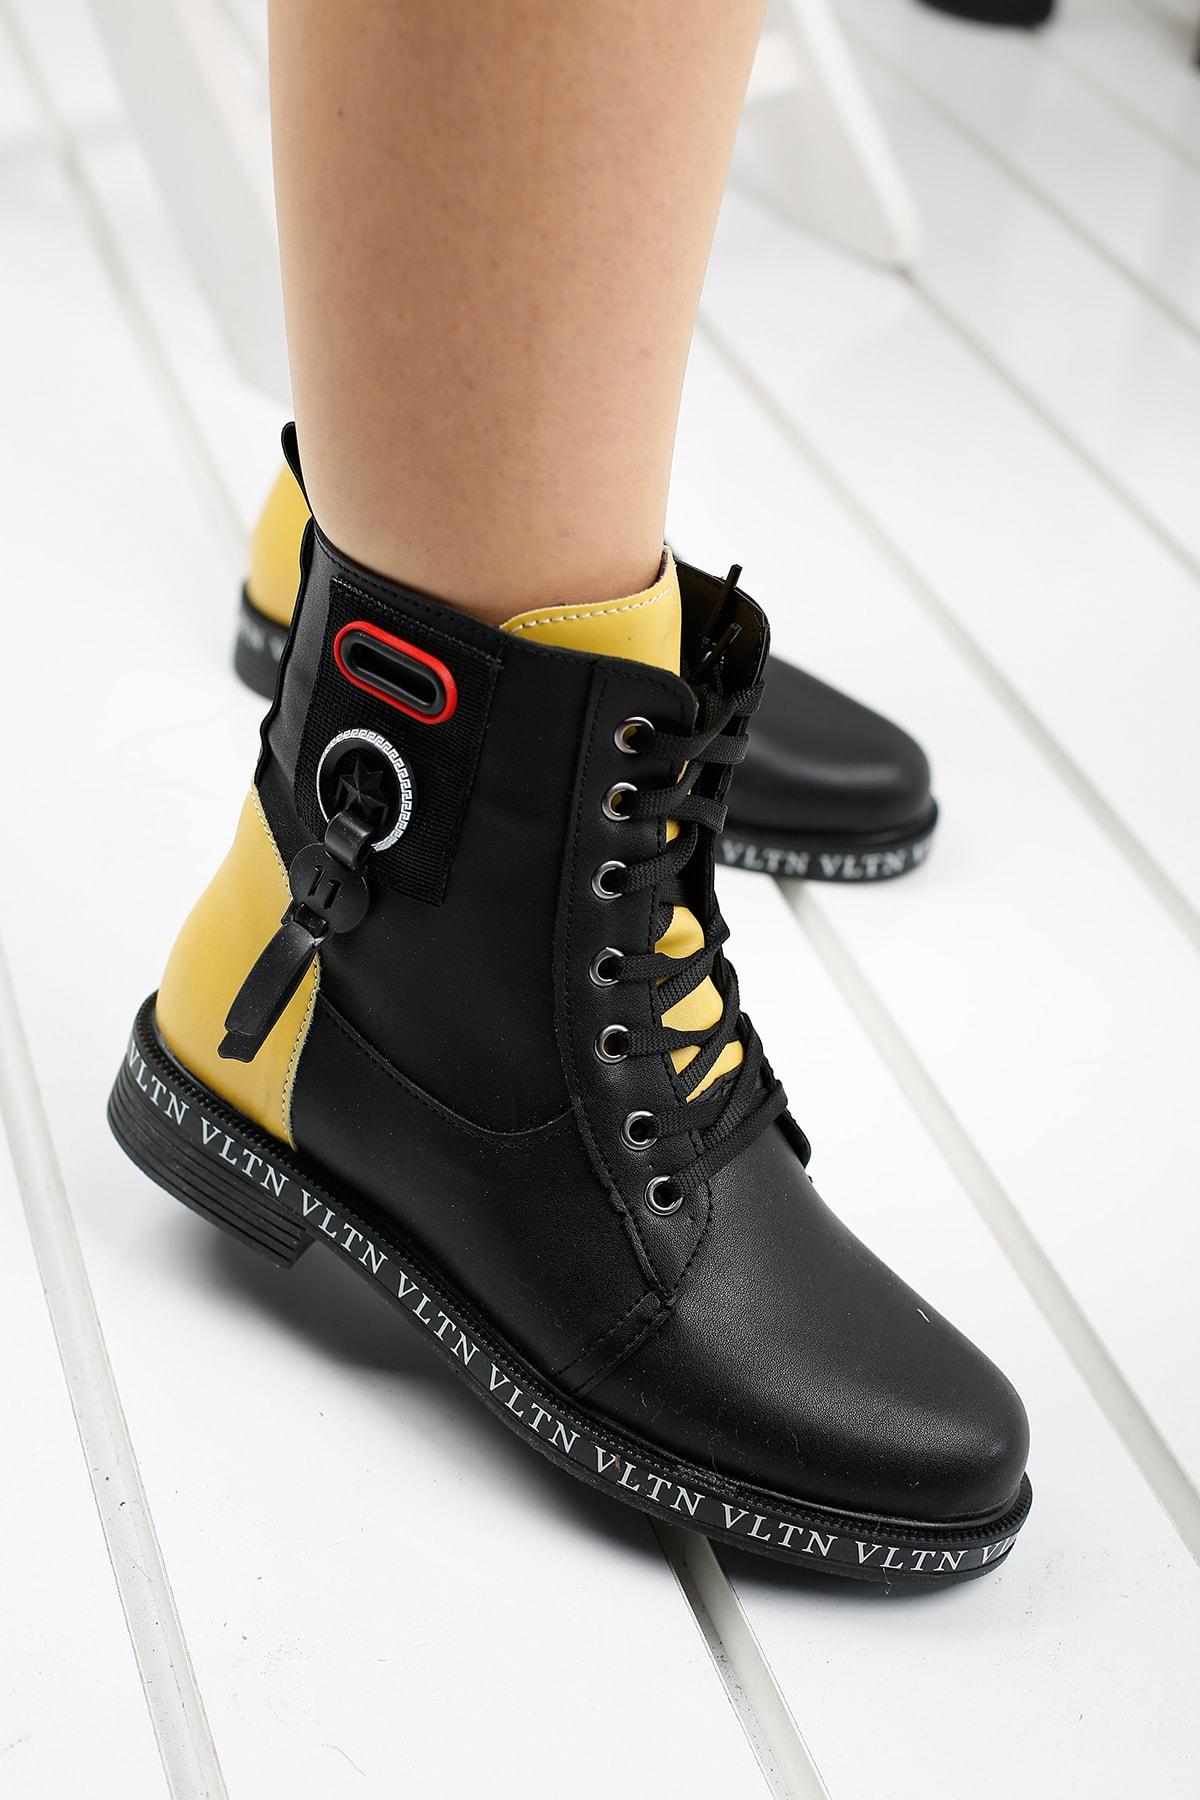 Ayakland Kadın Siyah Günlük Termo Taban Bot Ayakkabı Despina 41-1 1